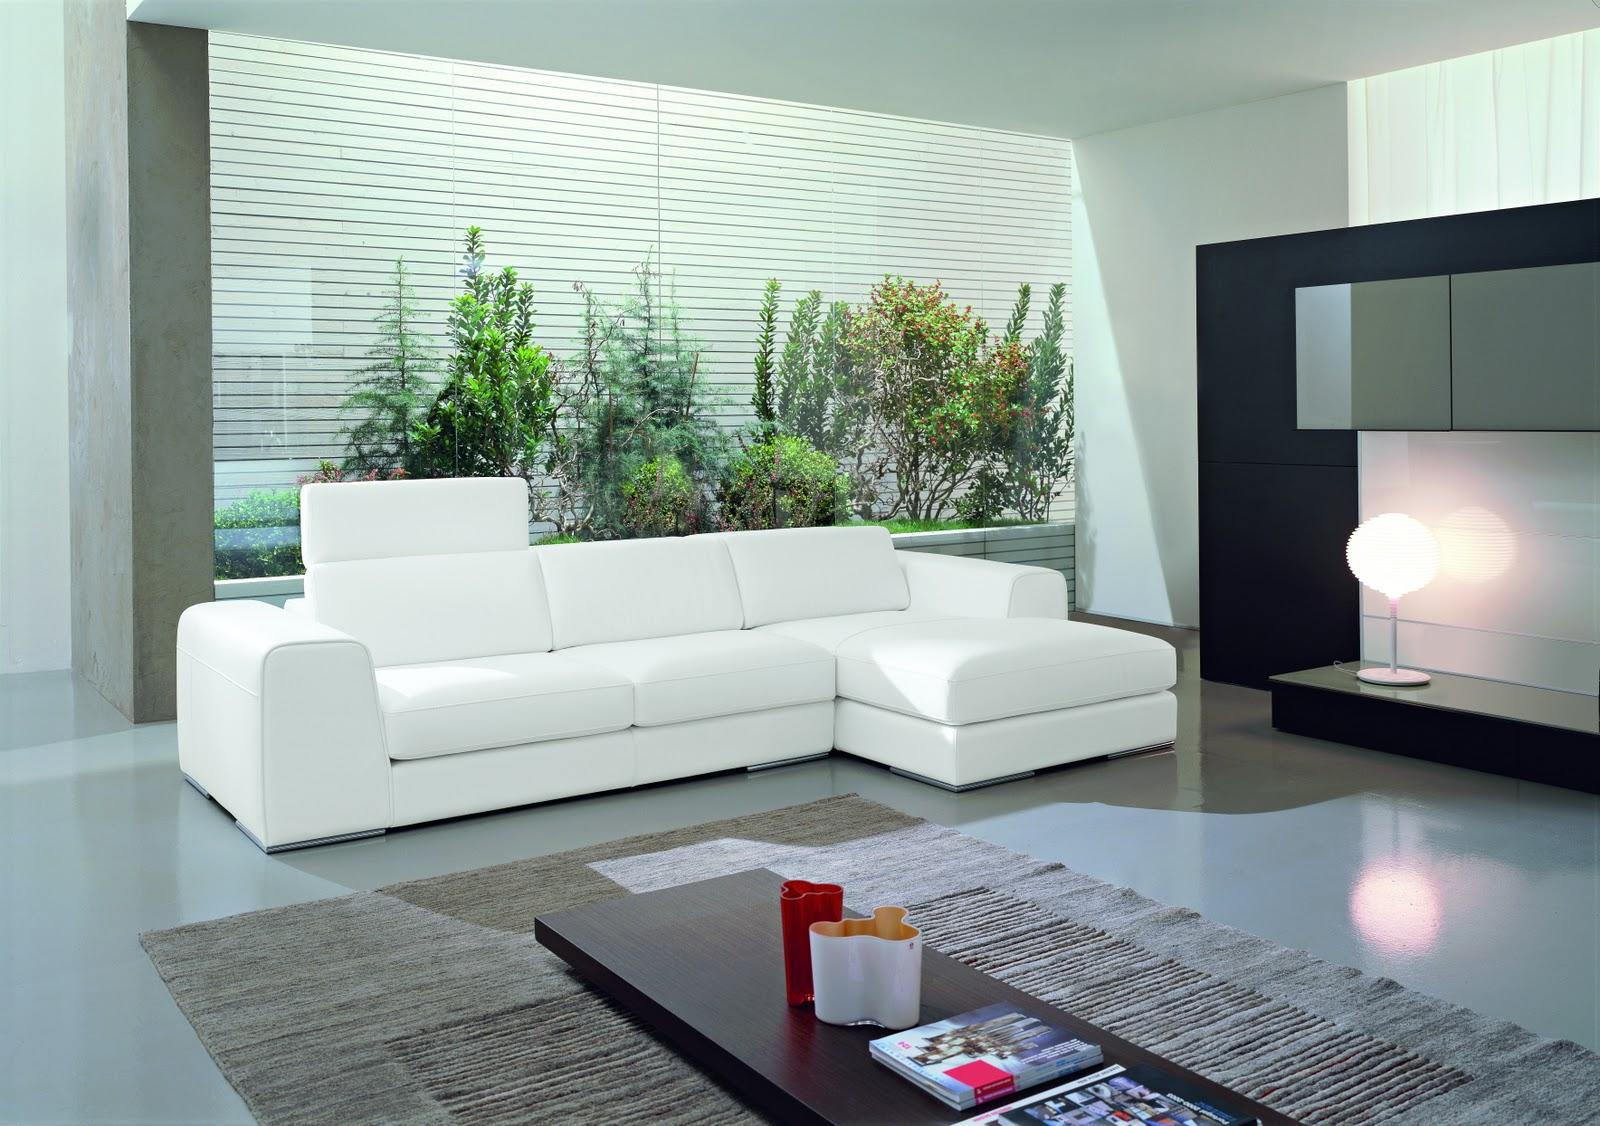 Divani blog tino mariani offerta divano moderno in for Divano moderno